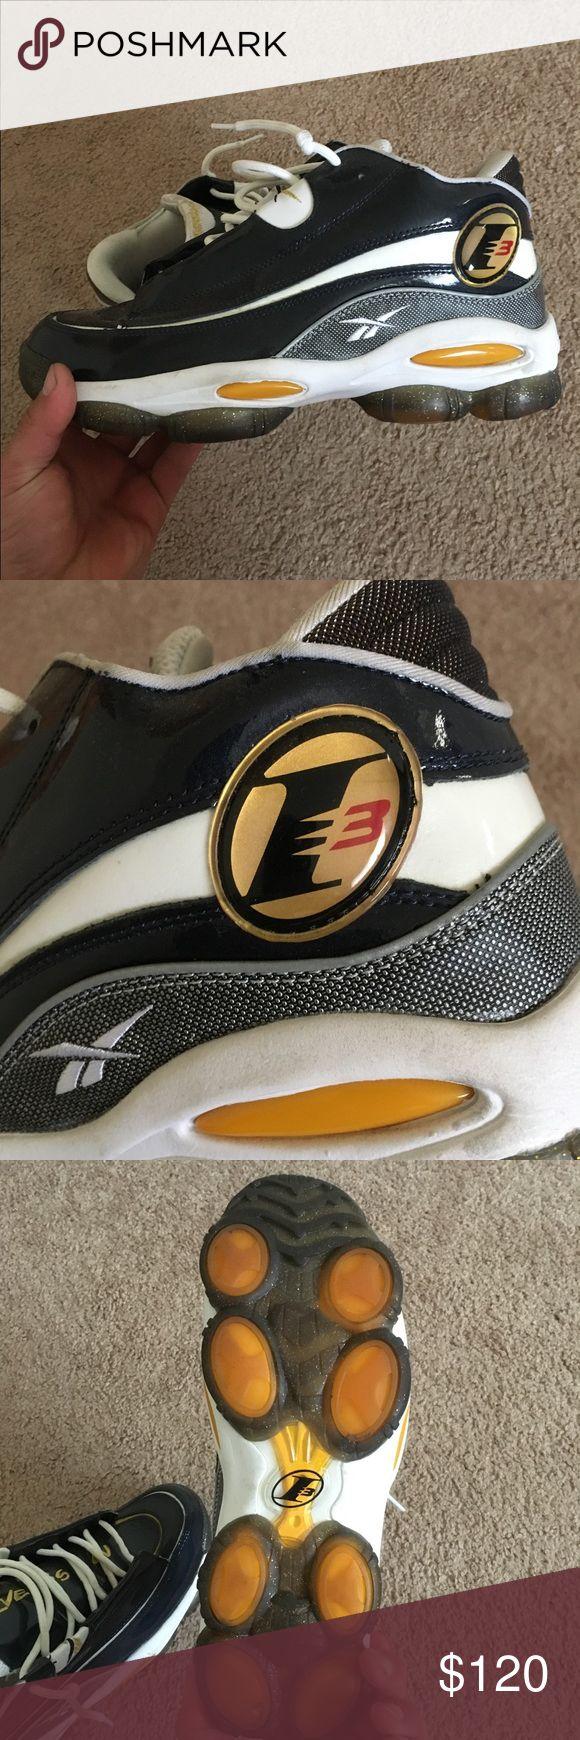 Reebok The Answer DMX 10 Allen Iverson I3 Sz 9.5 Navy (Patent Leather) *No Box* Reebok Shoes Athletic Shoes